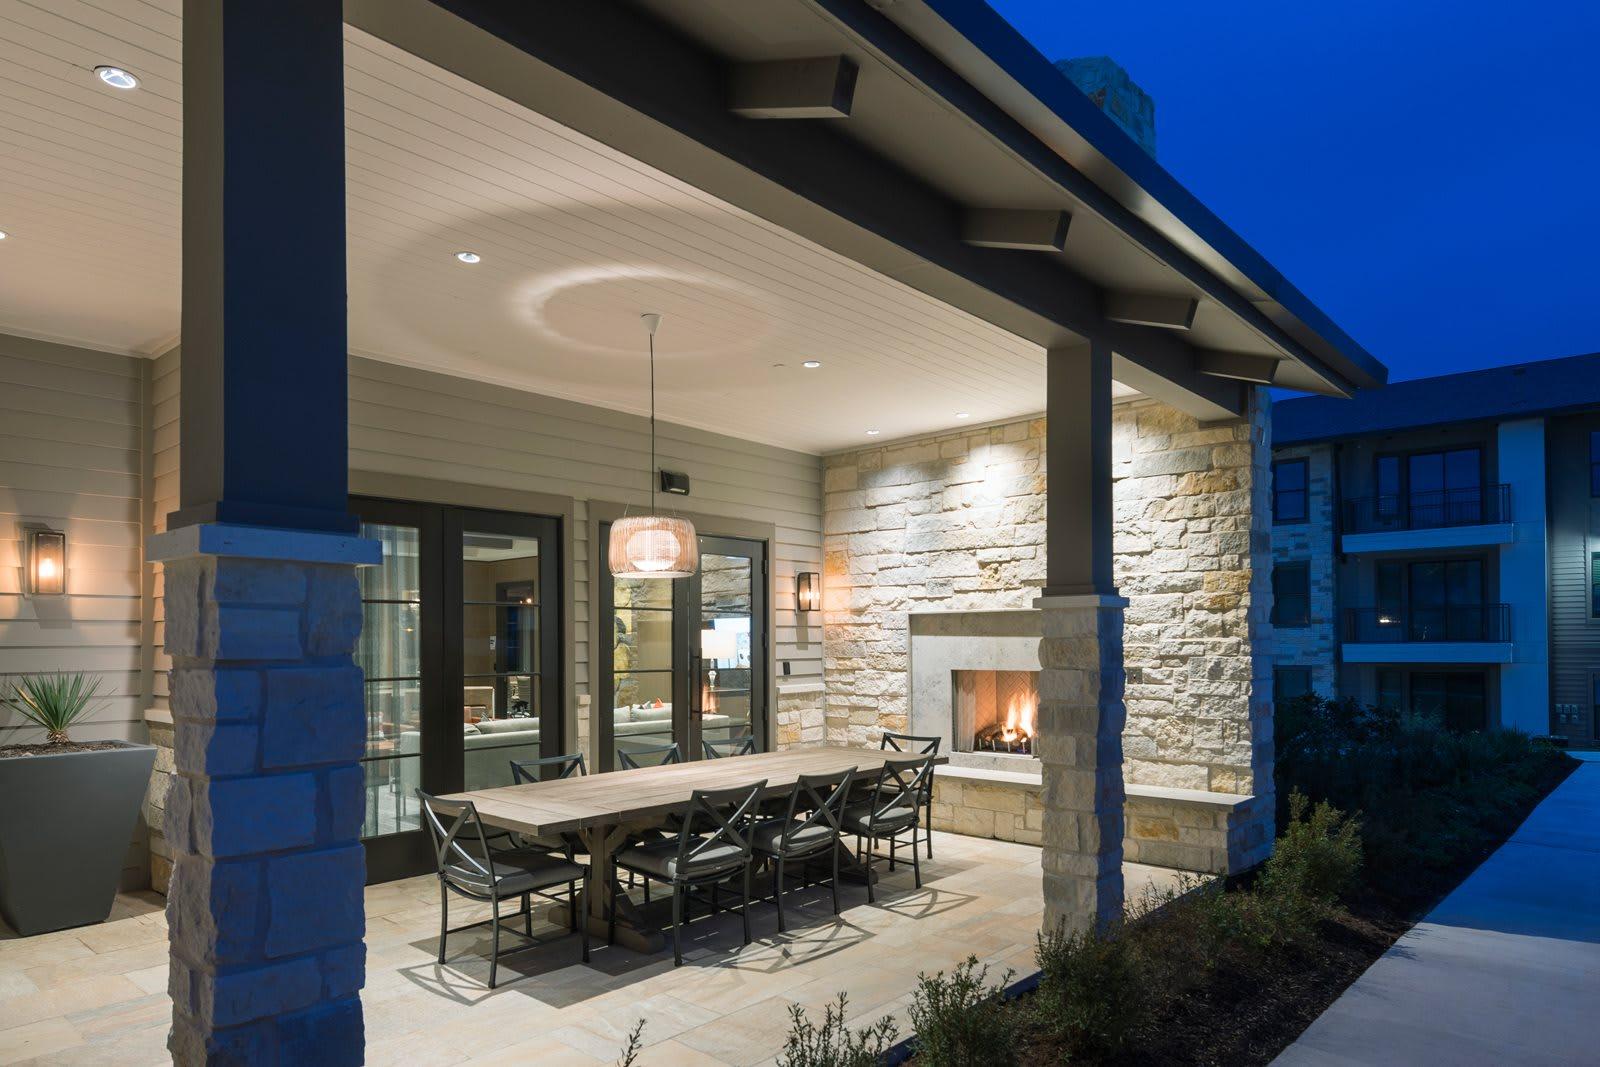 Outdoor Dining Area with Fireplace at Windsor Lantana Hills, Austin, Texas